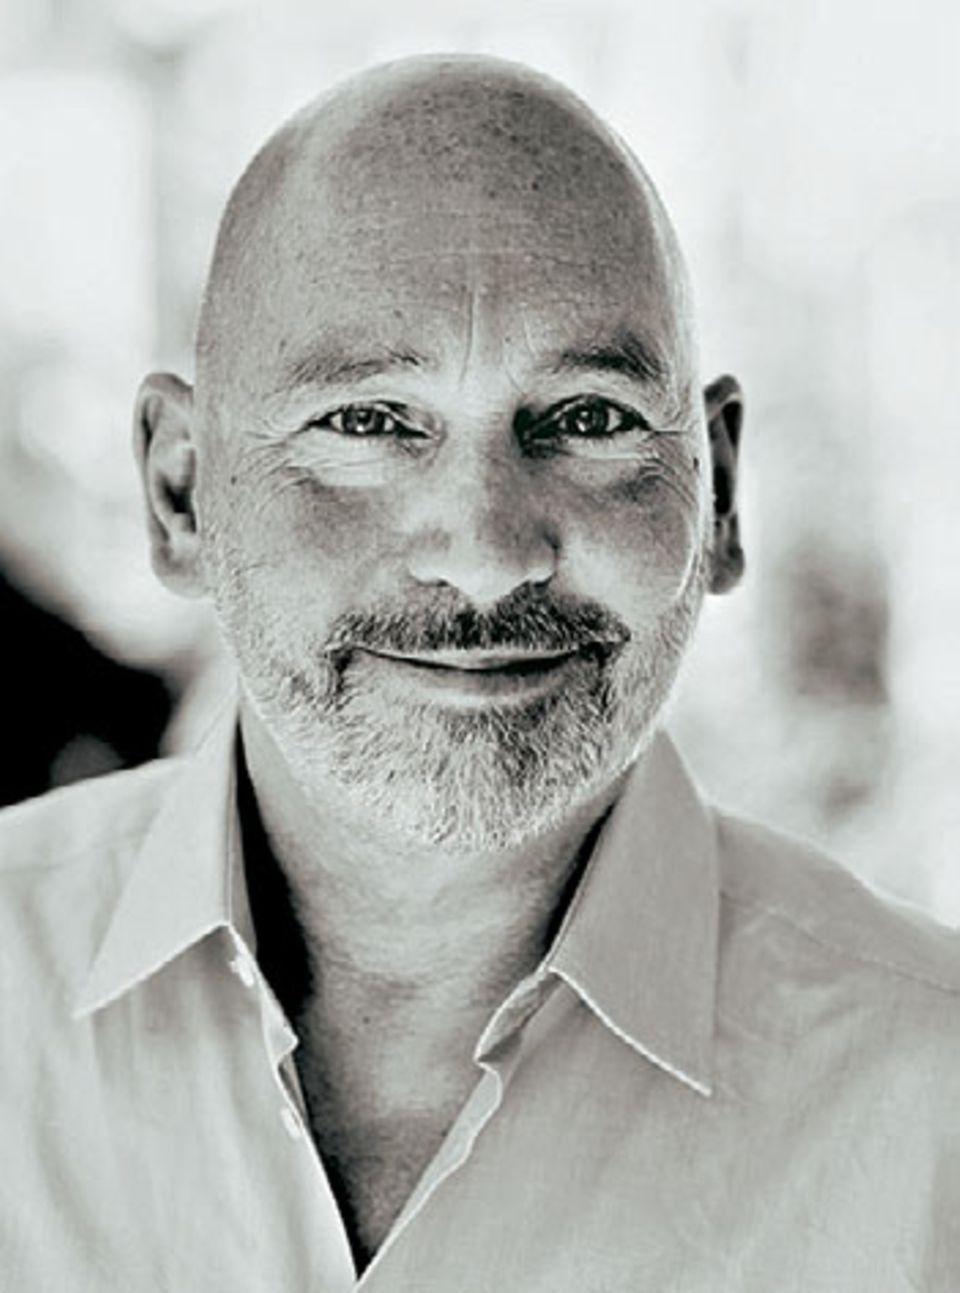 Langjährige Beziehungen: Oskar Holzberg im Porträt